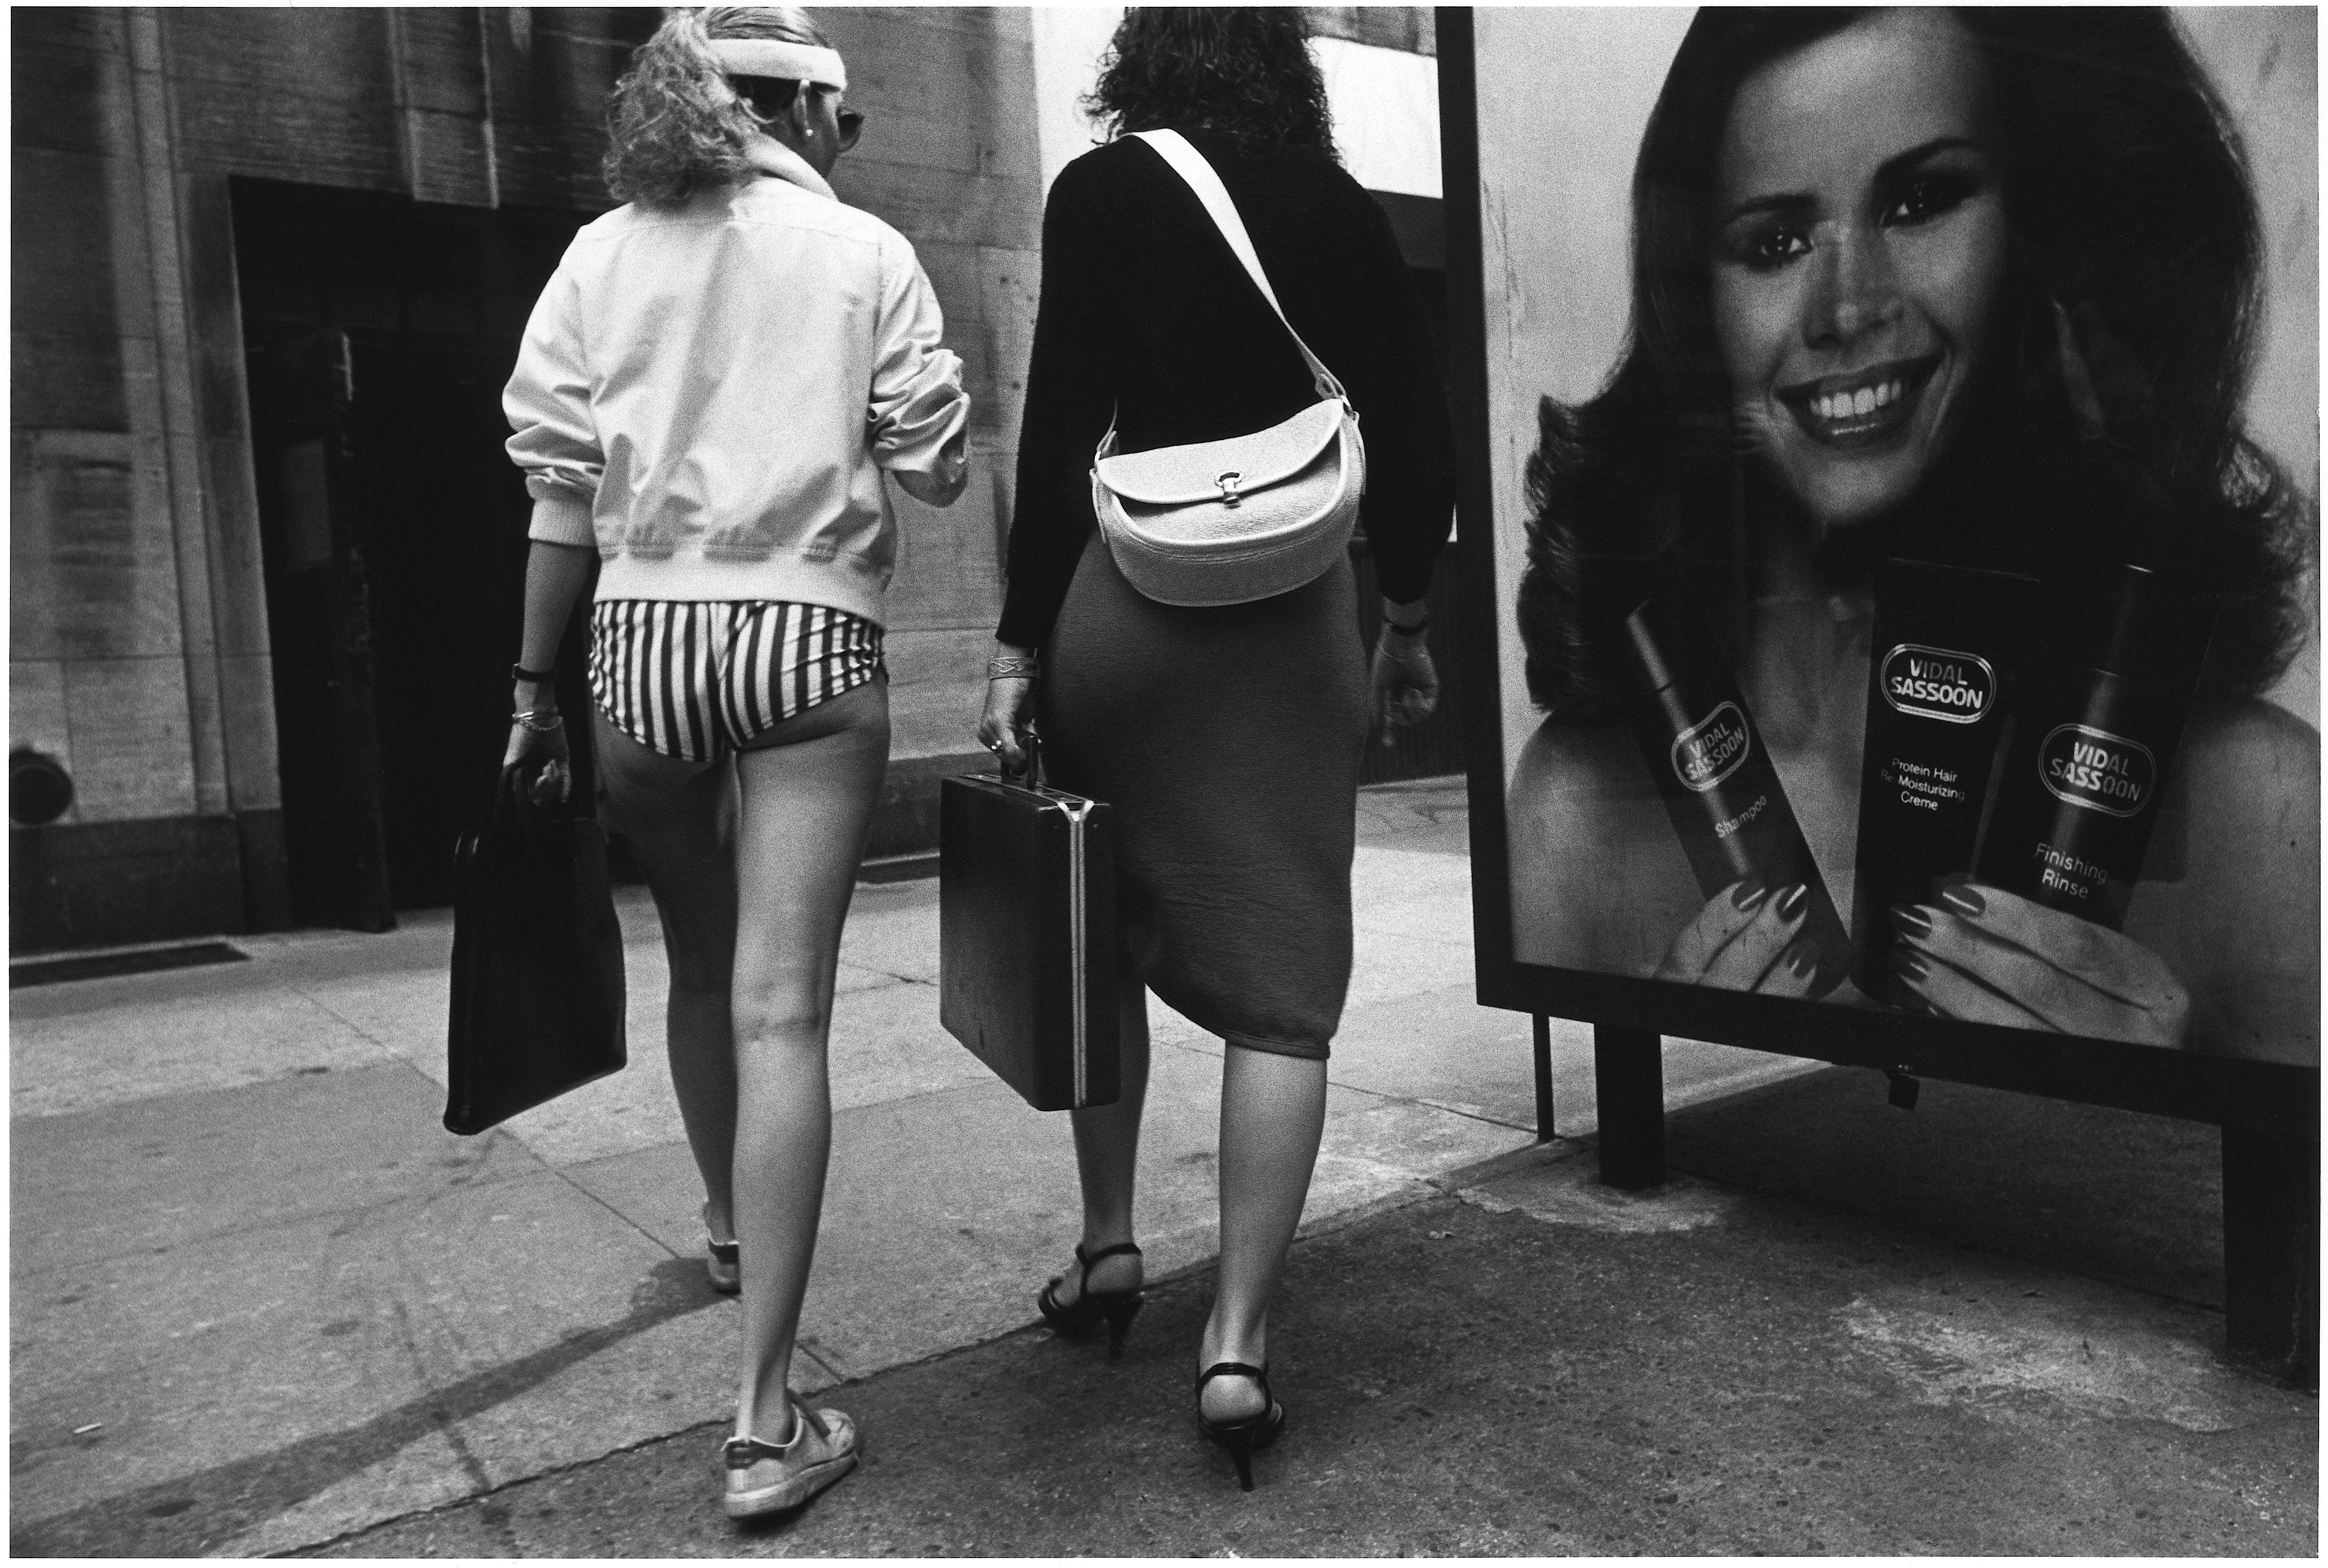 34th Street, 1981 Richard Sandler Photography